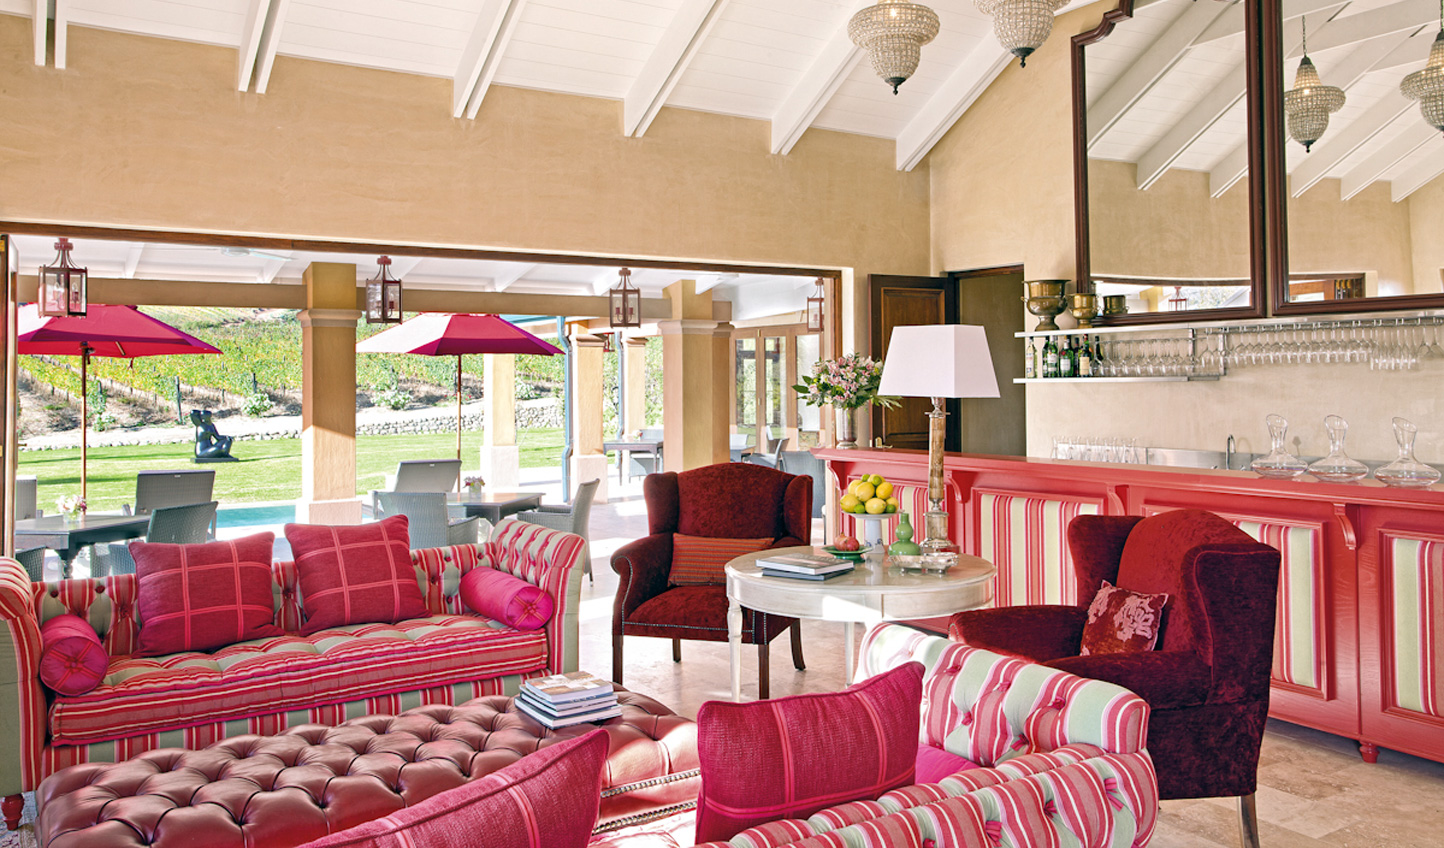 The plush lounge